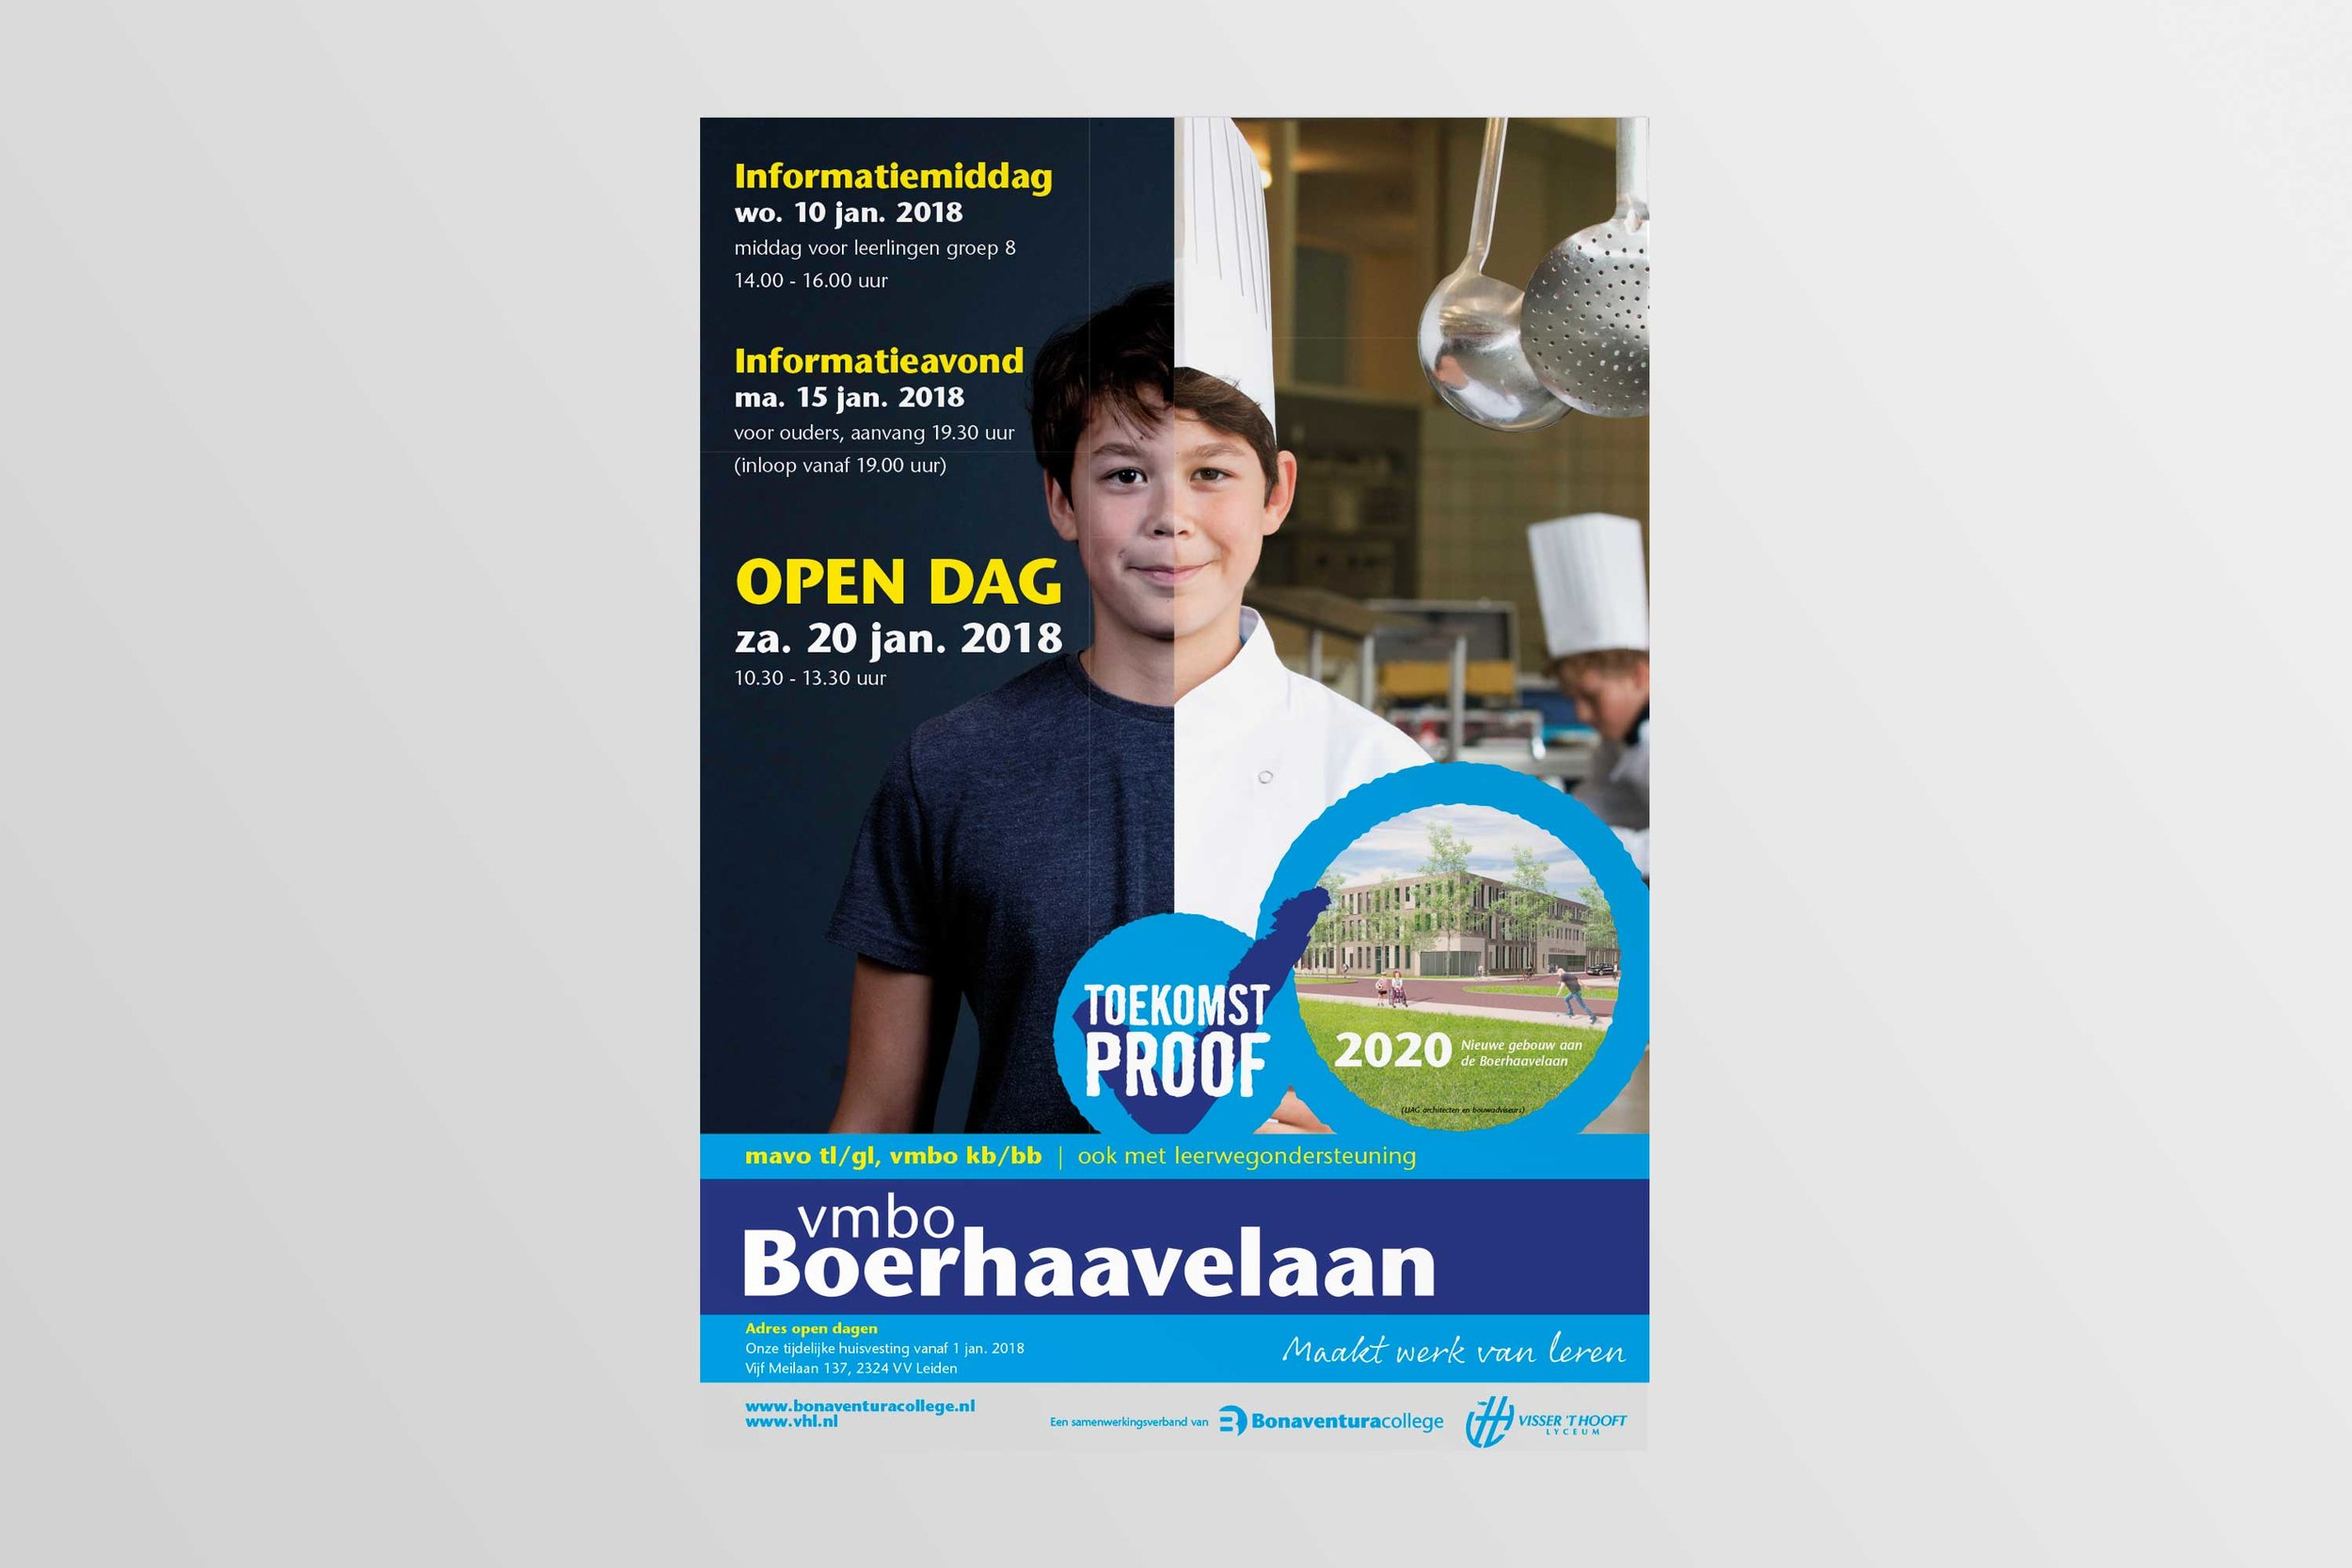 vmbo-boerhaavelaan-open-dag-poster.jpg